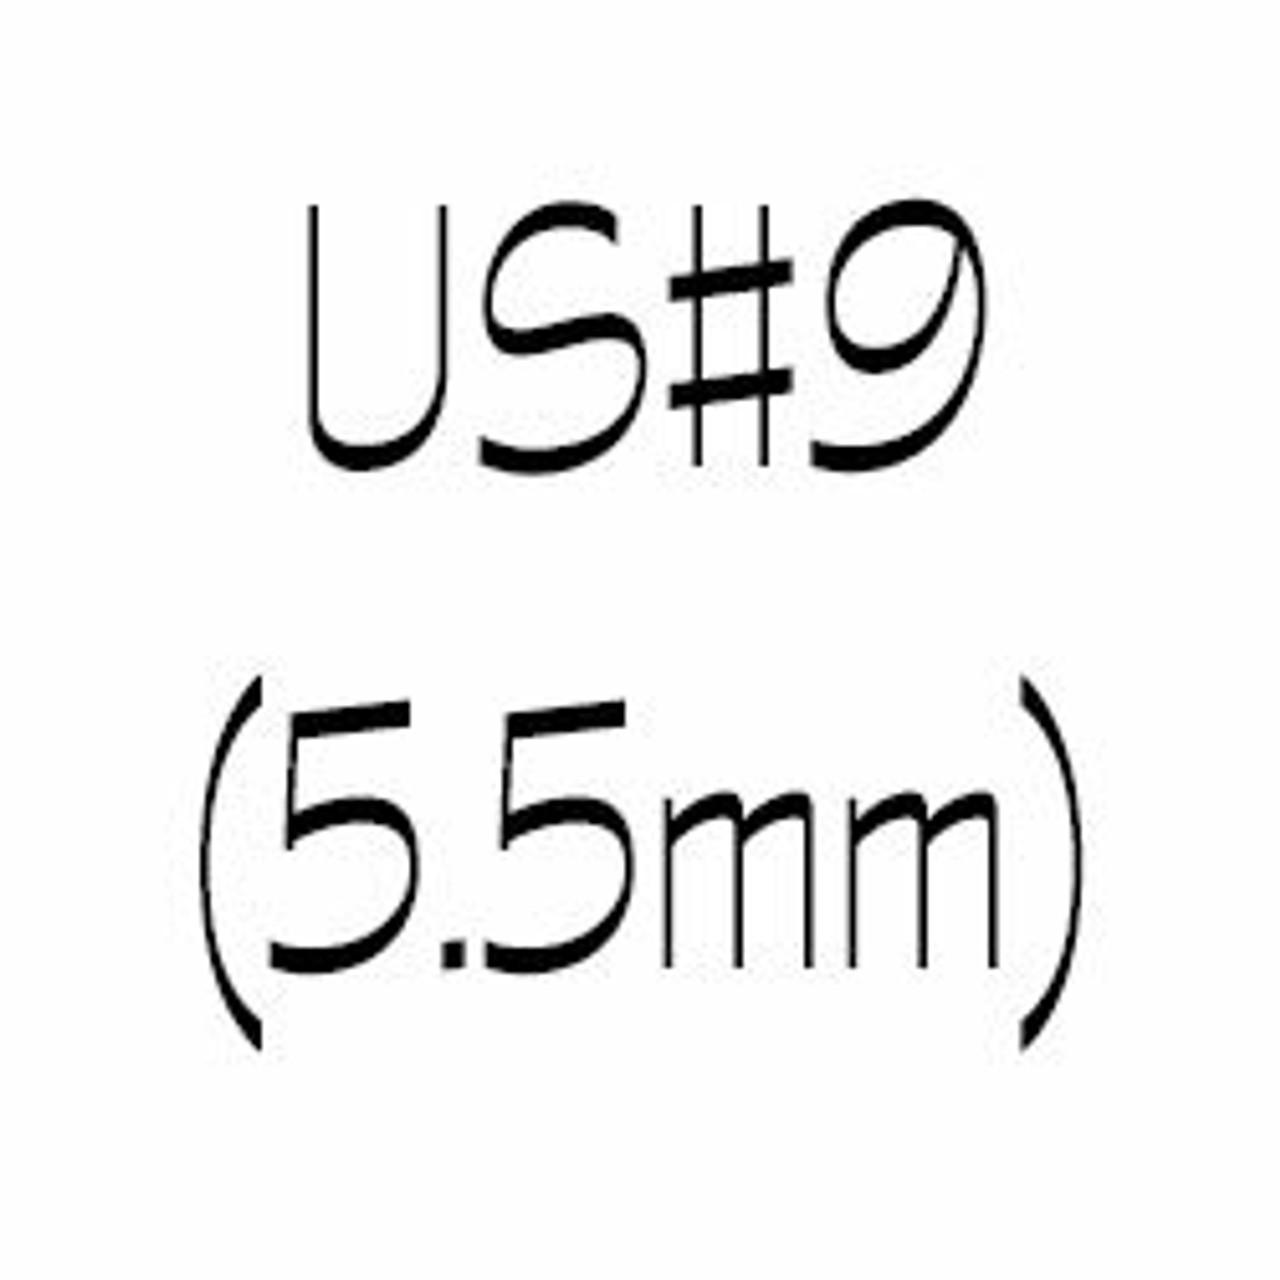 US#9 (5.5mm) Circular Knitting Needles